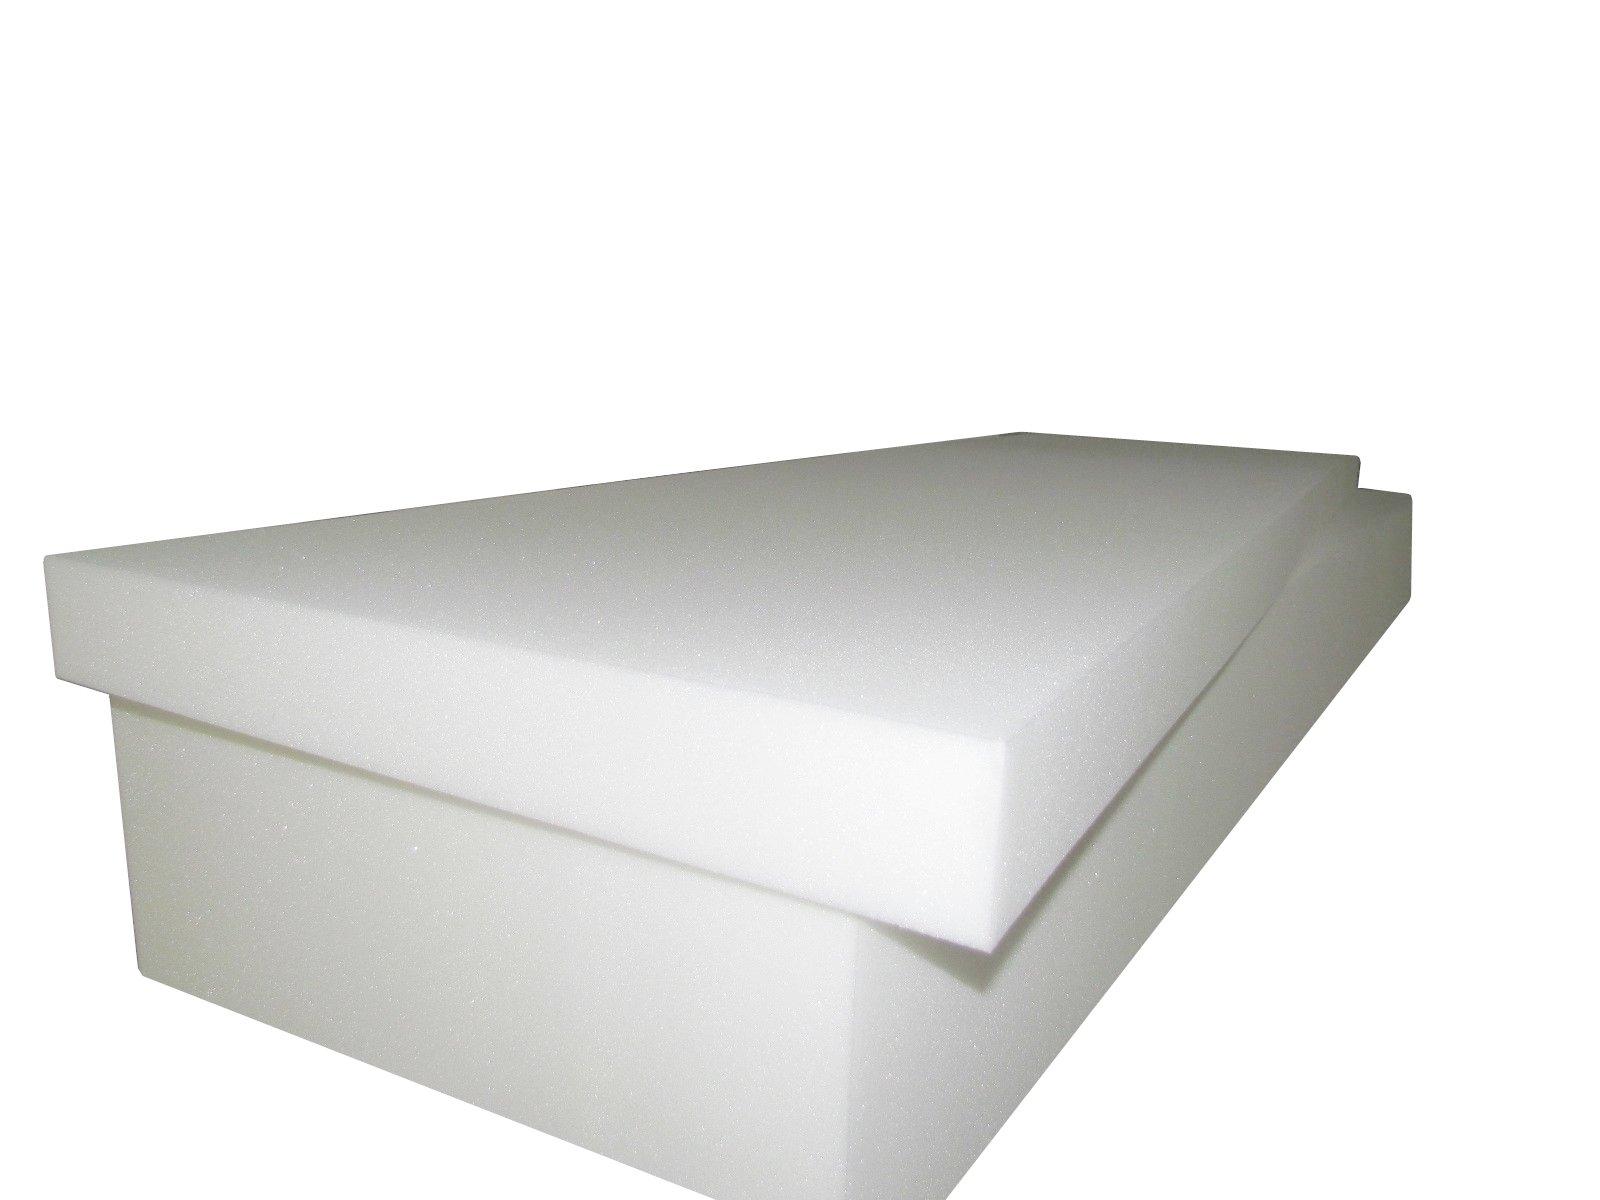 Foam Cushion 7''T x 27''W x 80''L (1536) ''MEDIUM FIRM'' Sofa Seat Replacement Foam Cushion, Upholstery Foam Slab, Foam Padding by Isellfoam